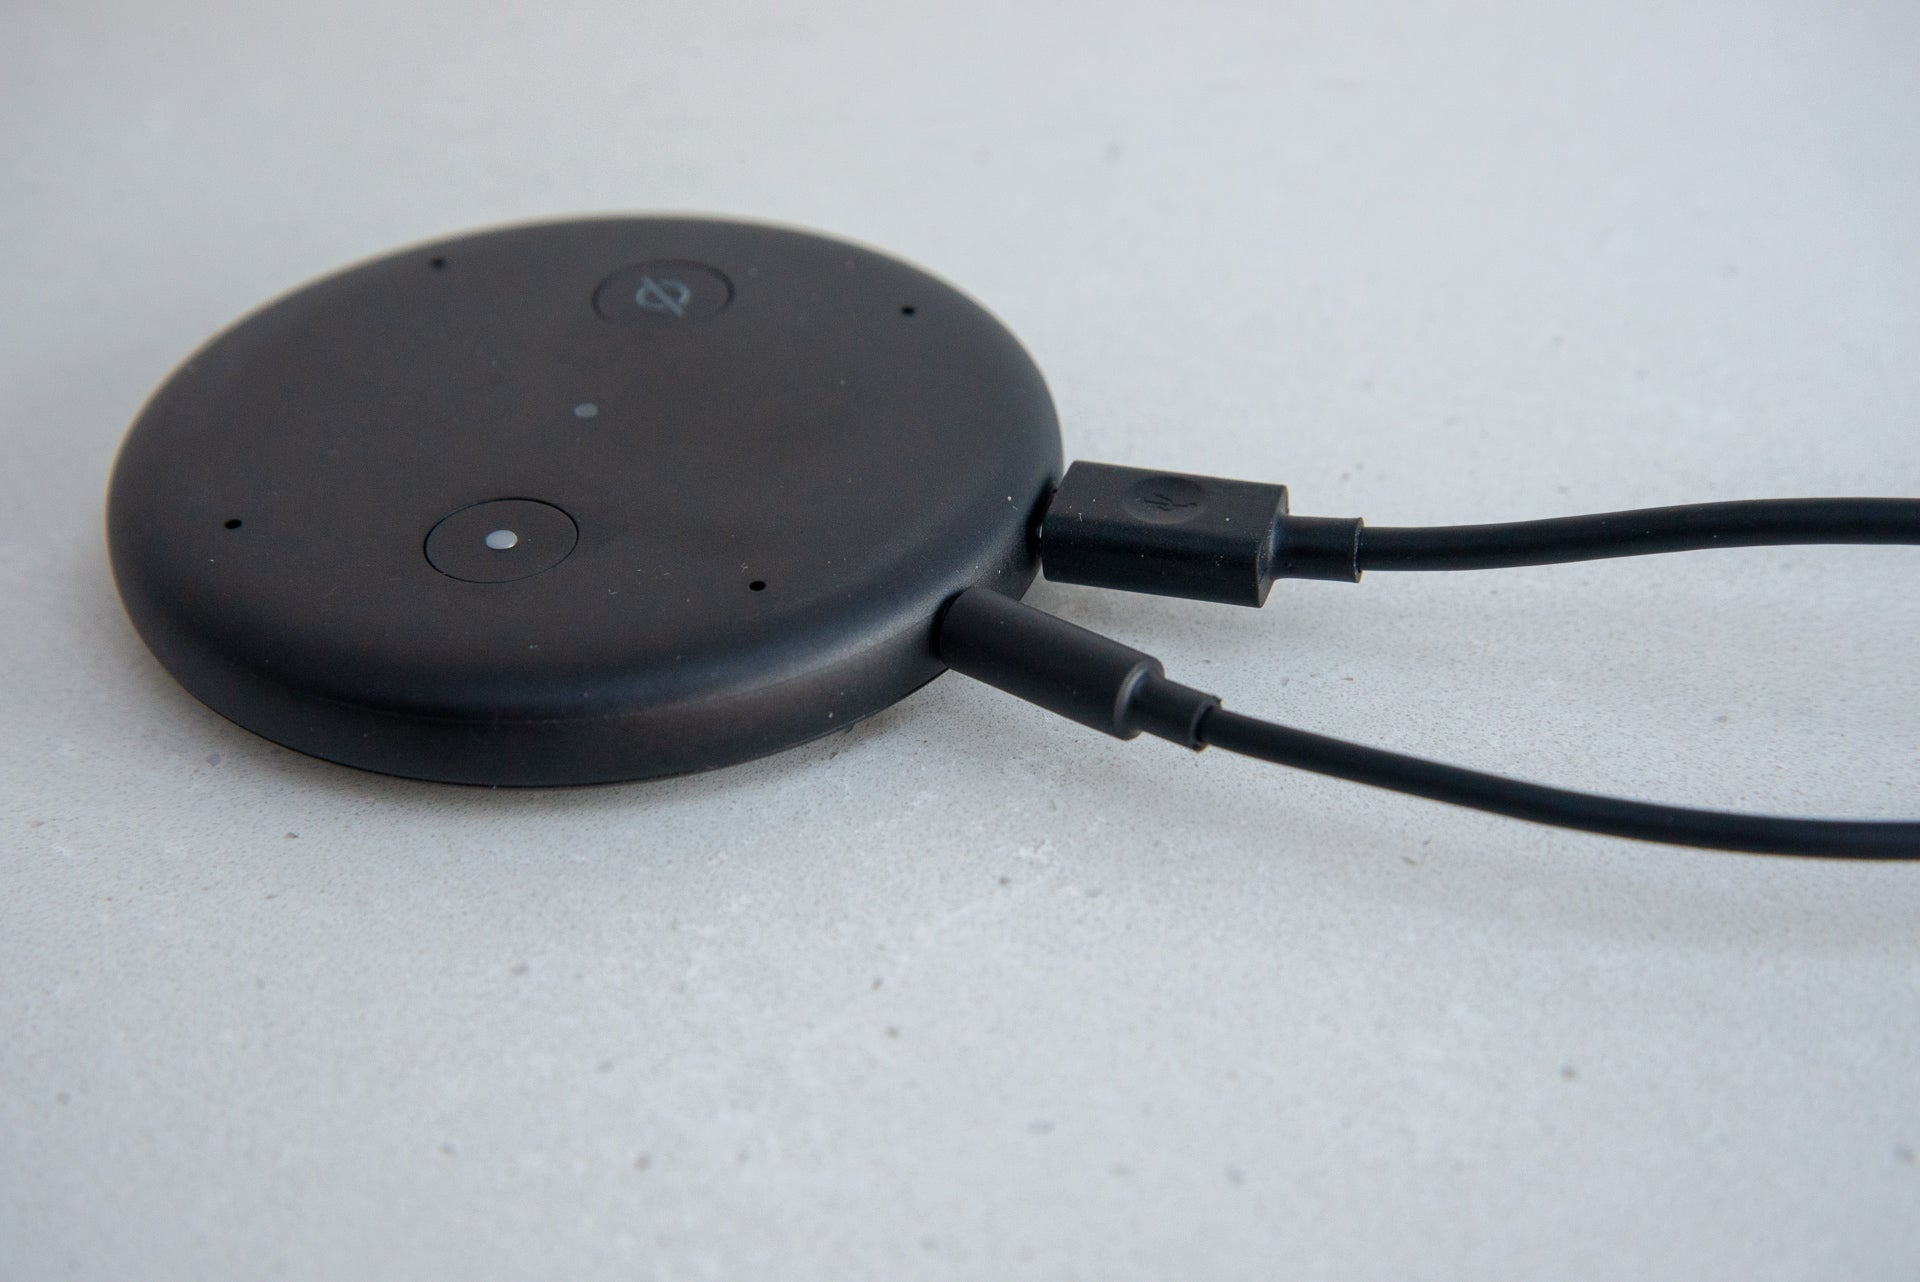 Amazon Echo Input 3.5mm input